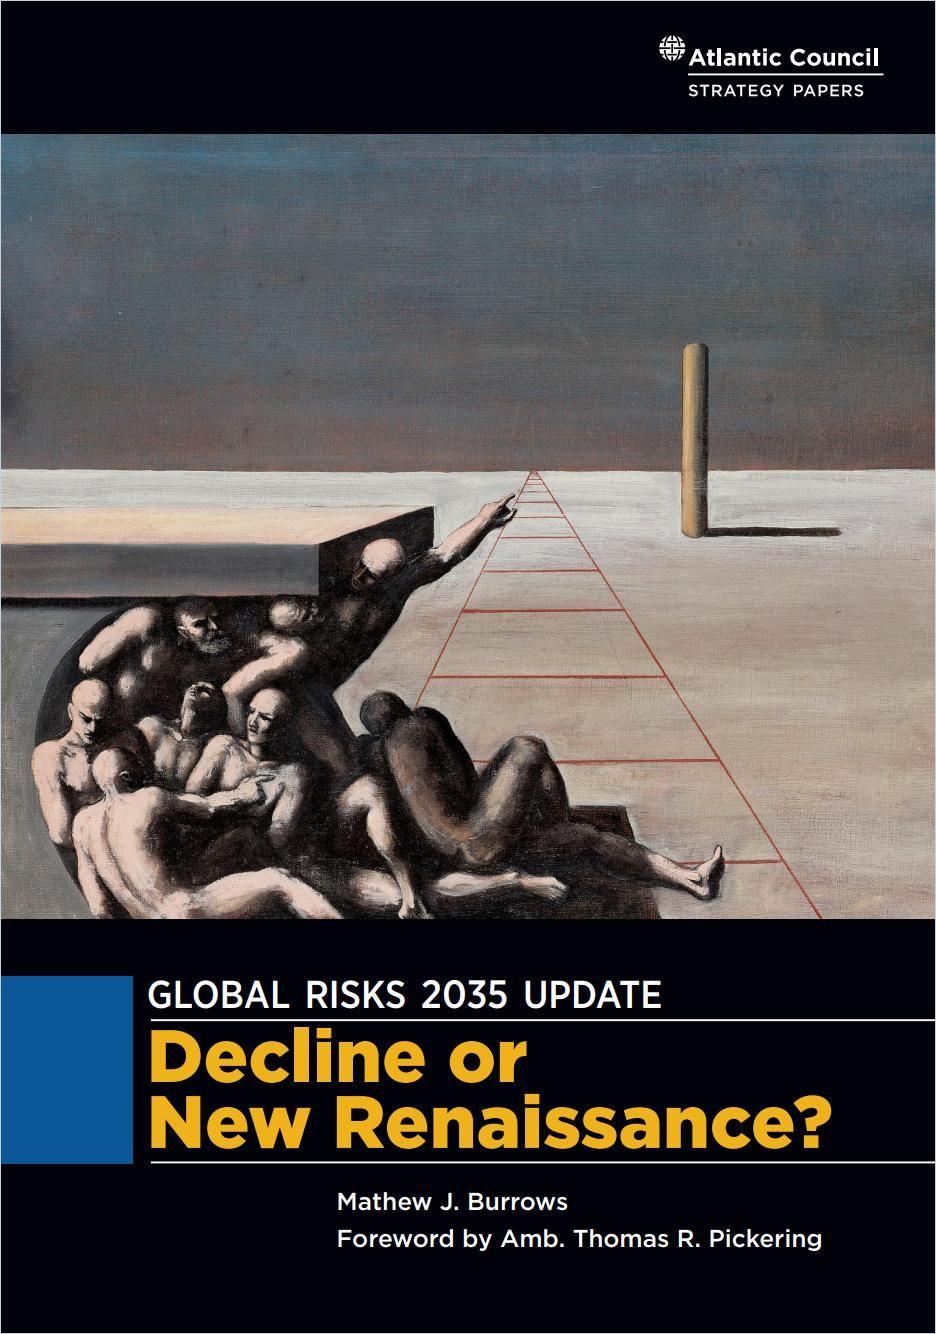 Image of: Global Risks 2035 Update: Decline or New Renaissance?